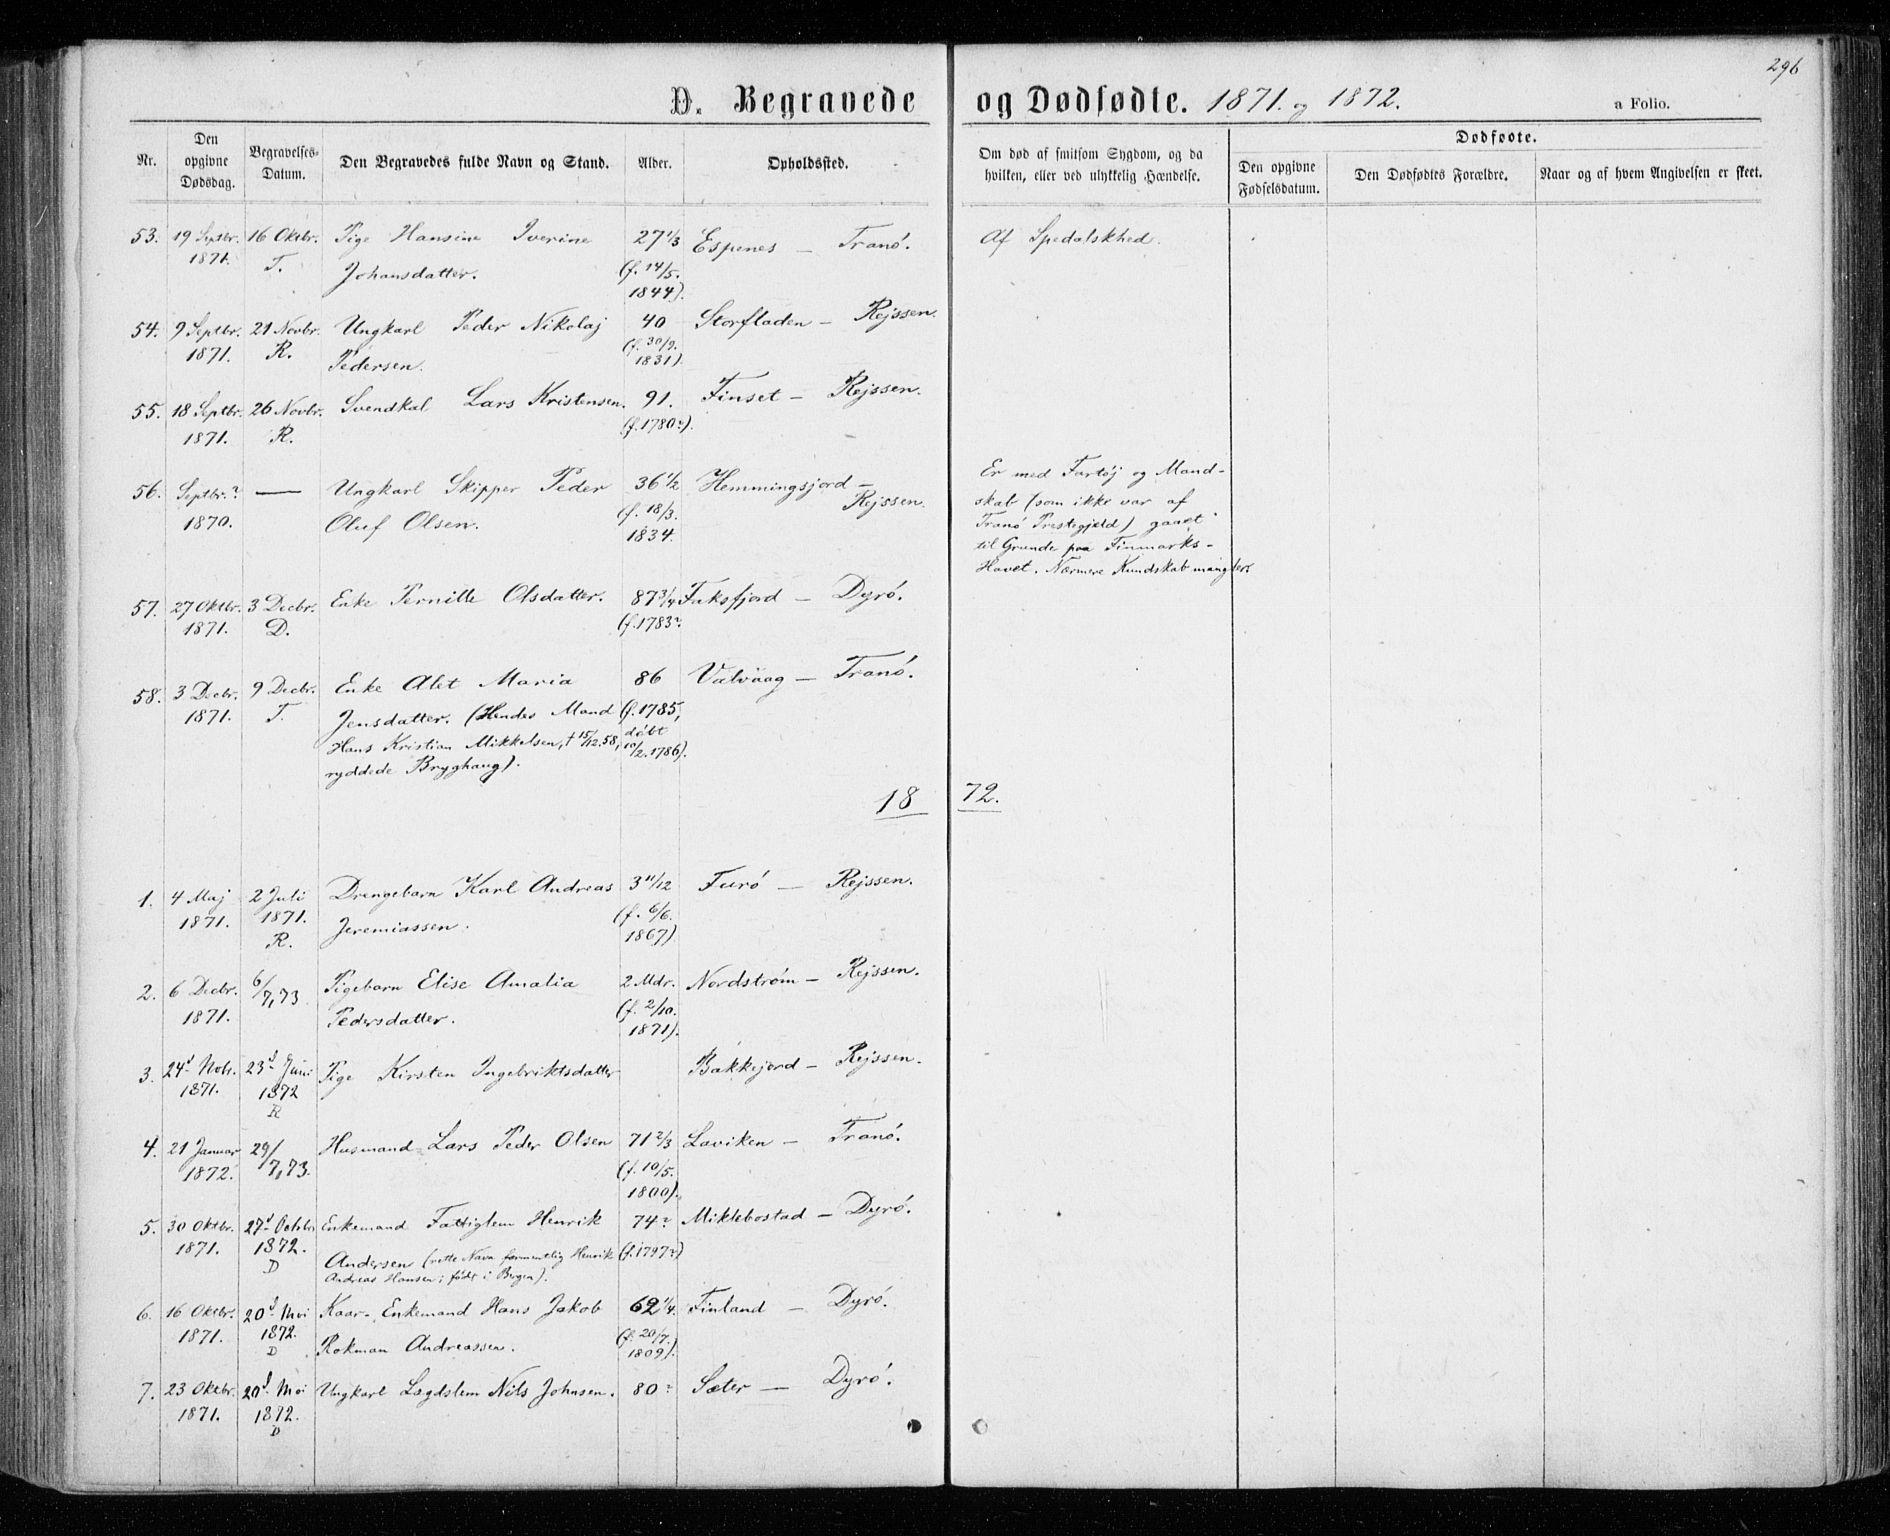 SATØ, Tranøy sokneprestkontor, I/Ia/Iaa/L0008kirke: Ministerialbok nr. 8, 1867-1877, s. 296